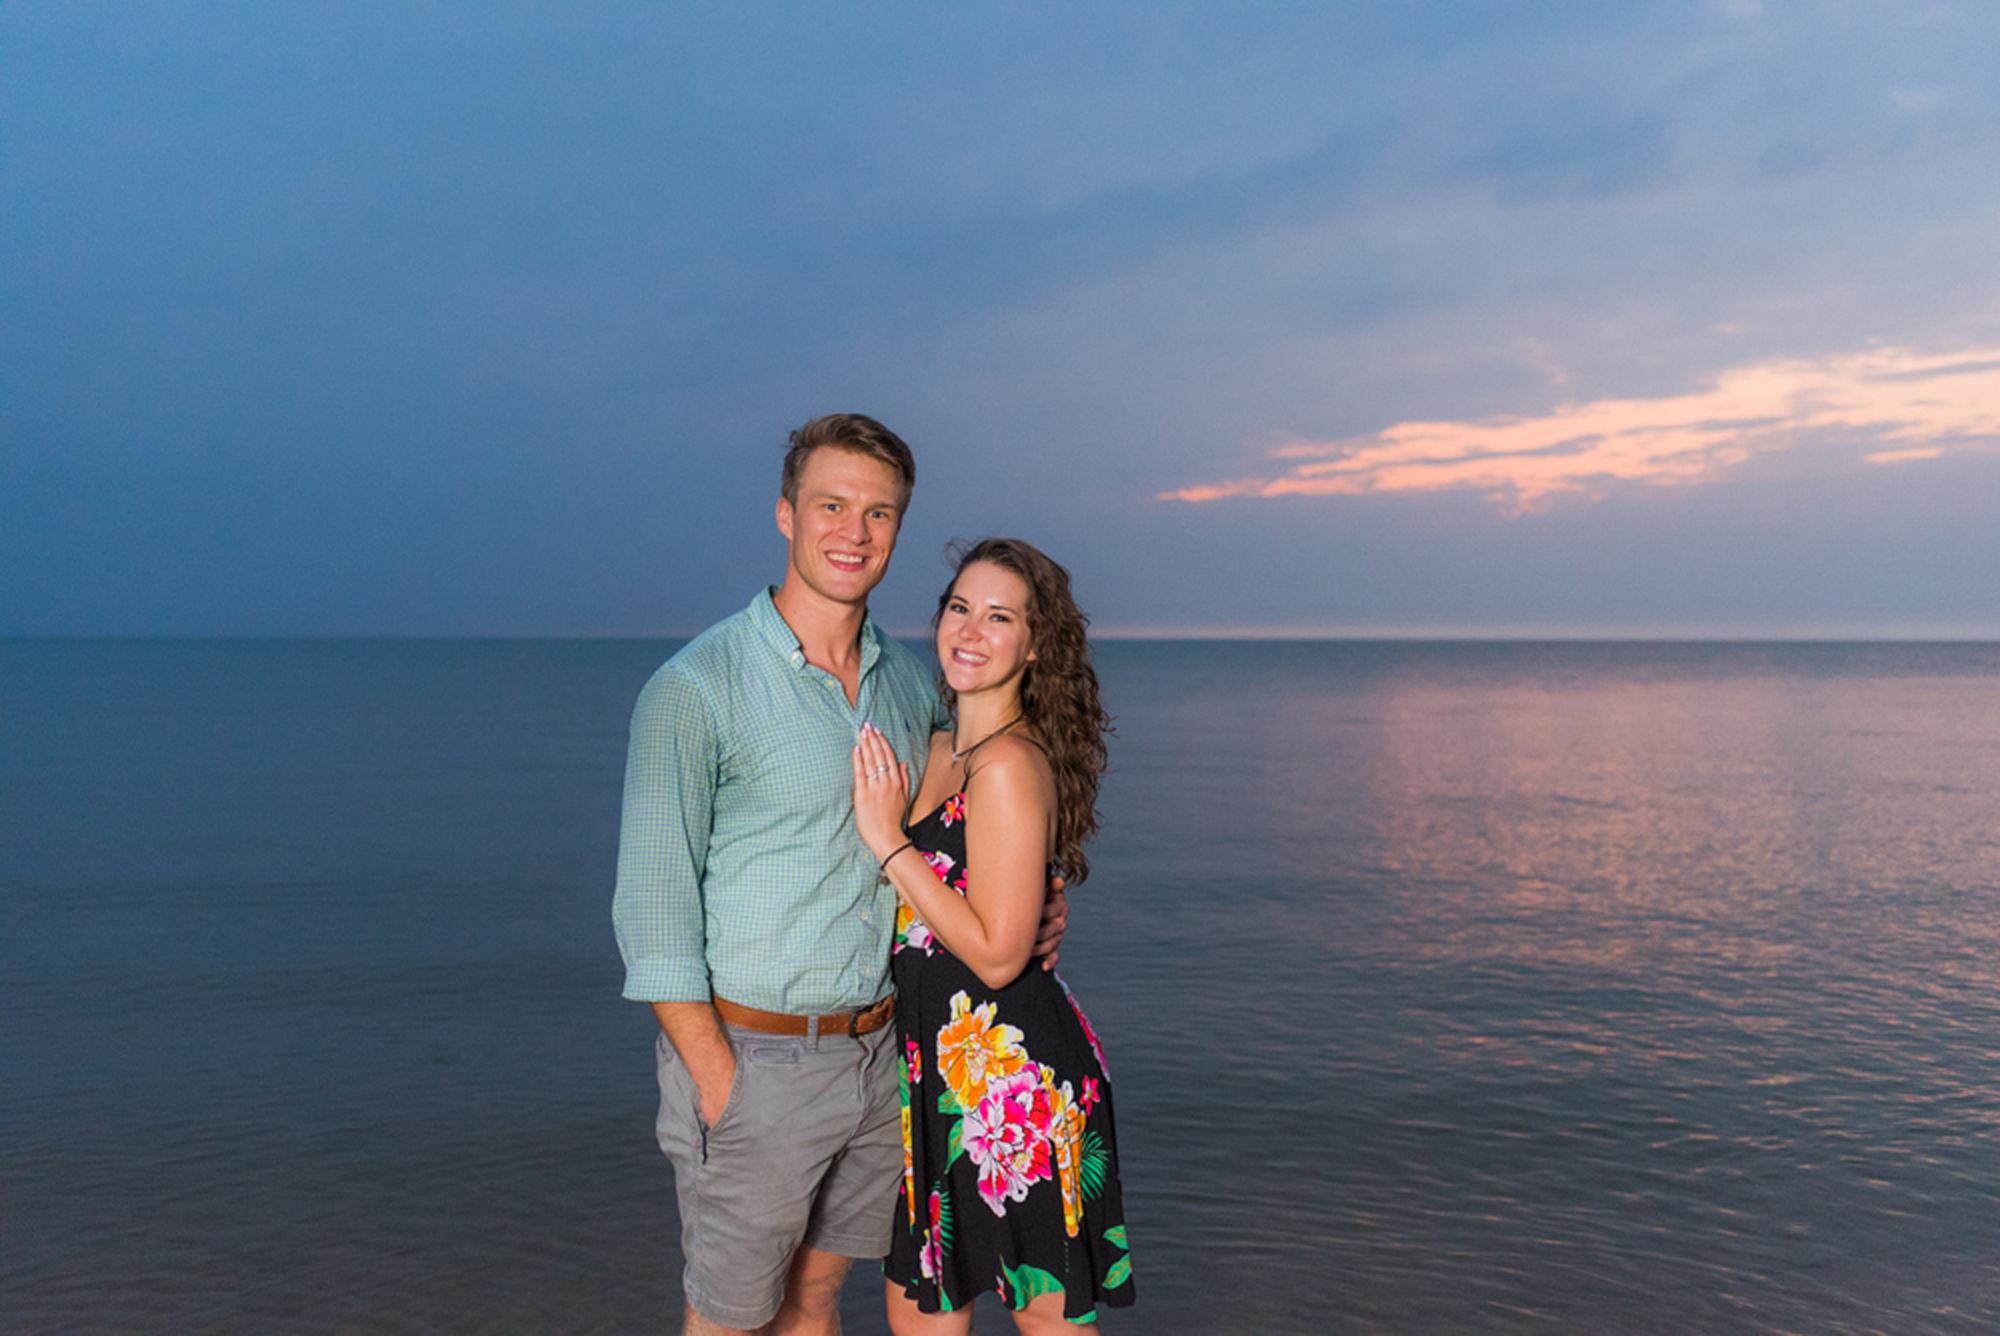 south-haven-michigan-beach-engagement-proposal-photographer-sydney-marie (28).jpg